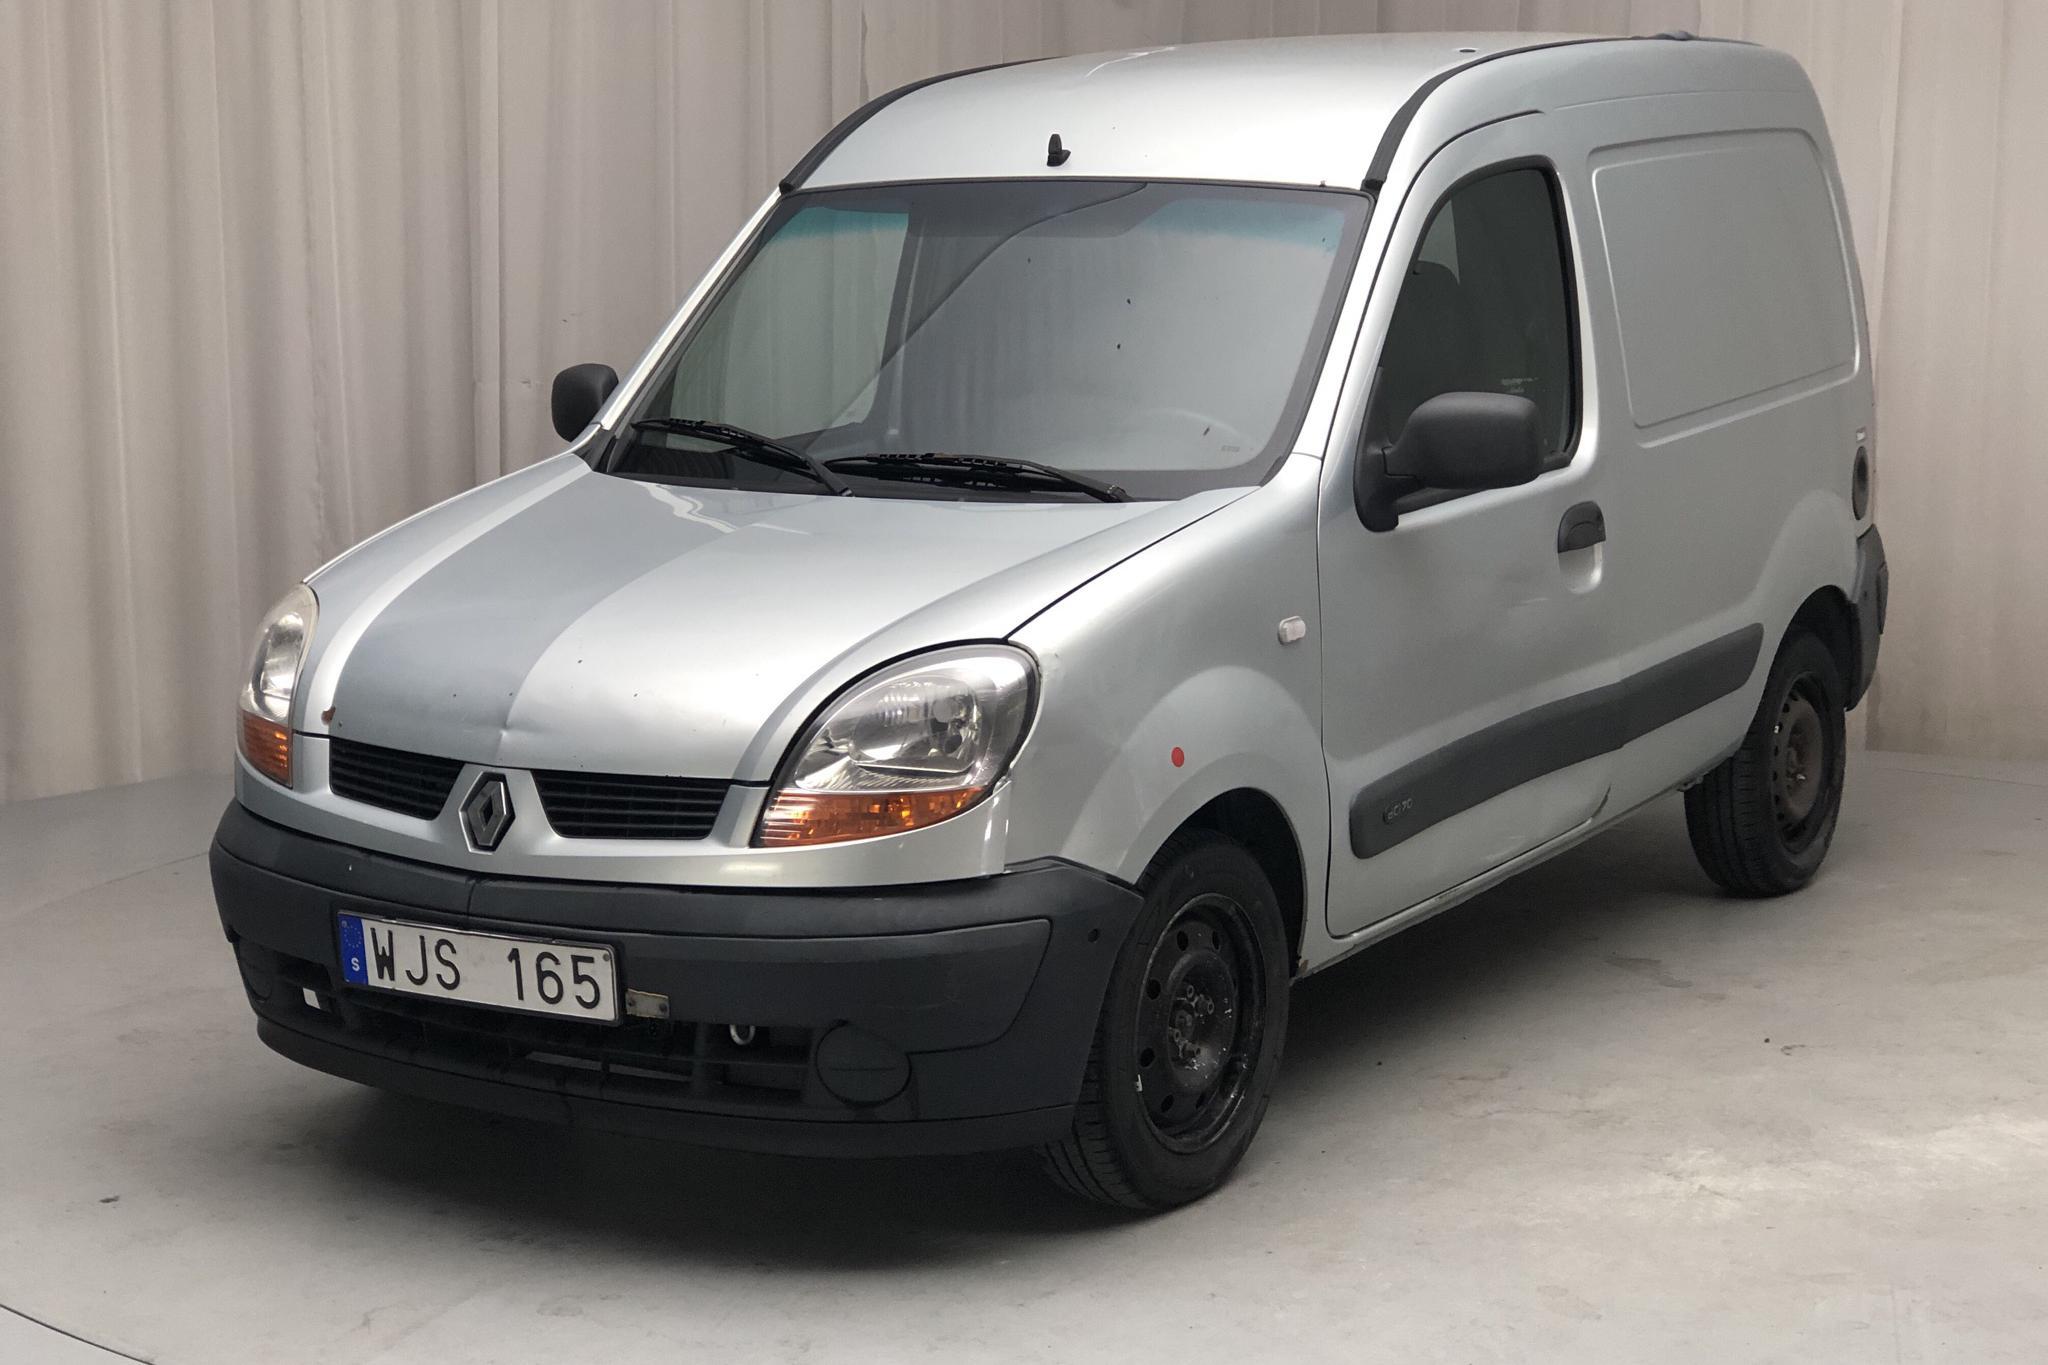 Renault Kangoo Express 1.5 dCi Skåp (65hk) - 27 283 mil - Manuell - Light Grey - 2004